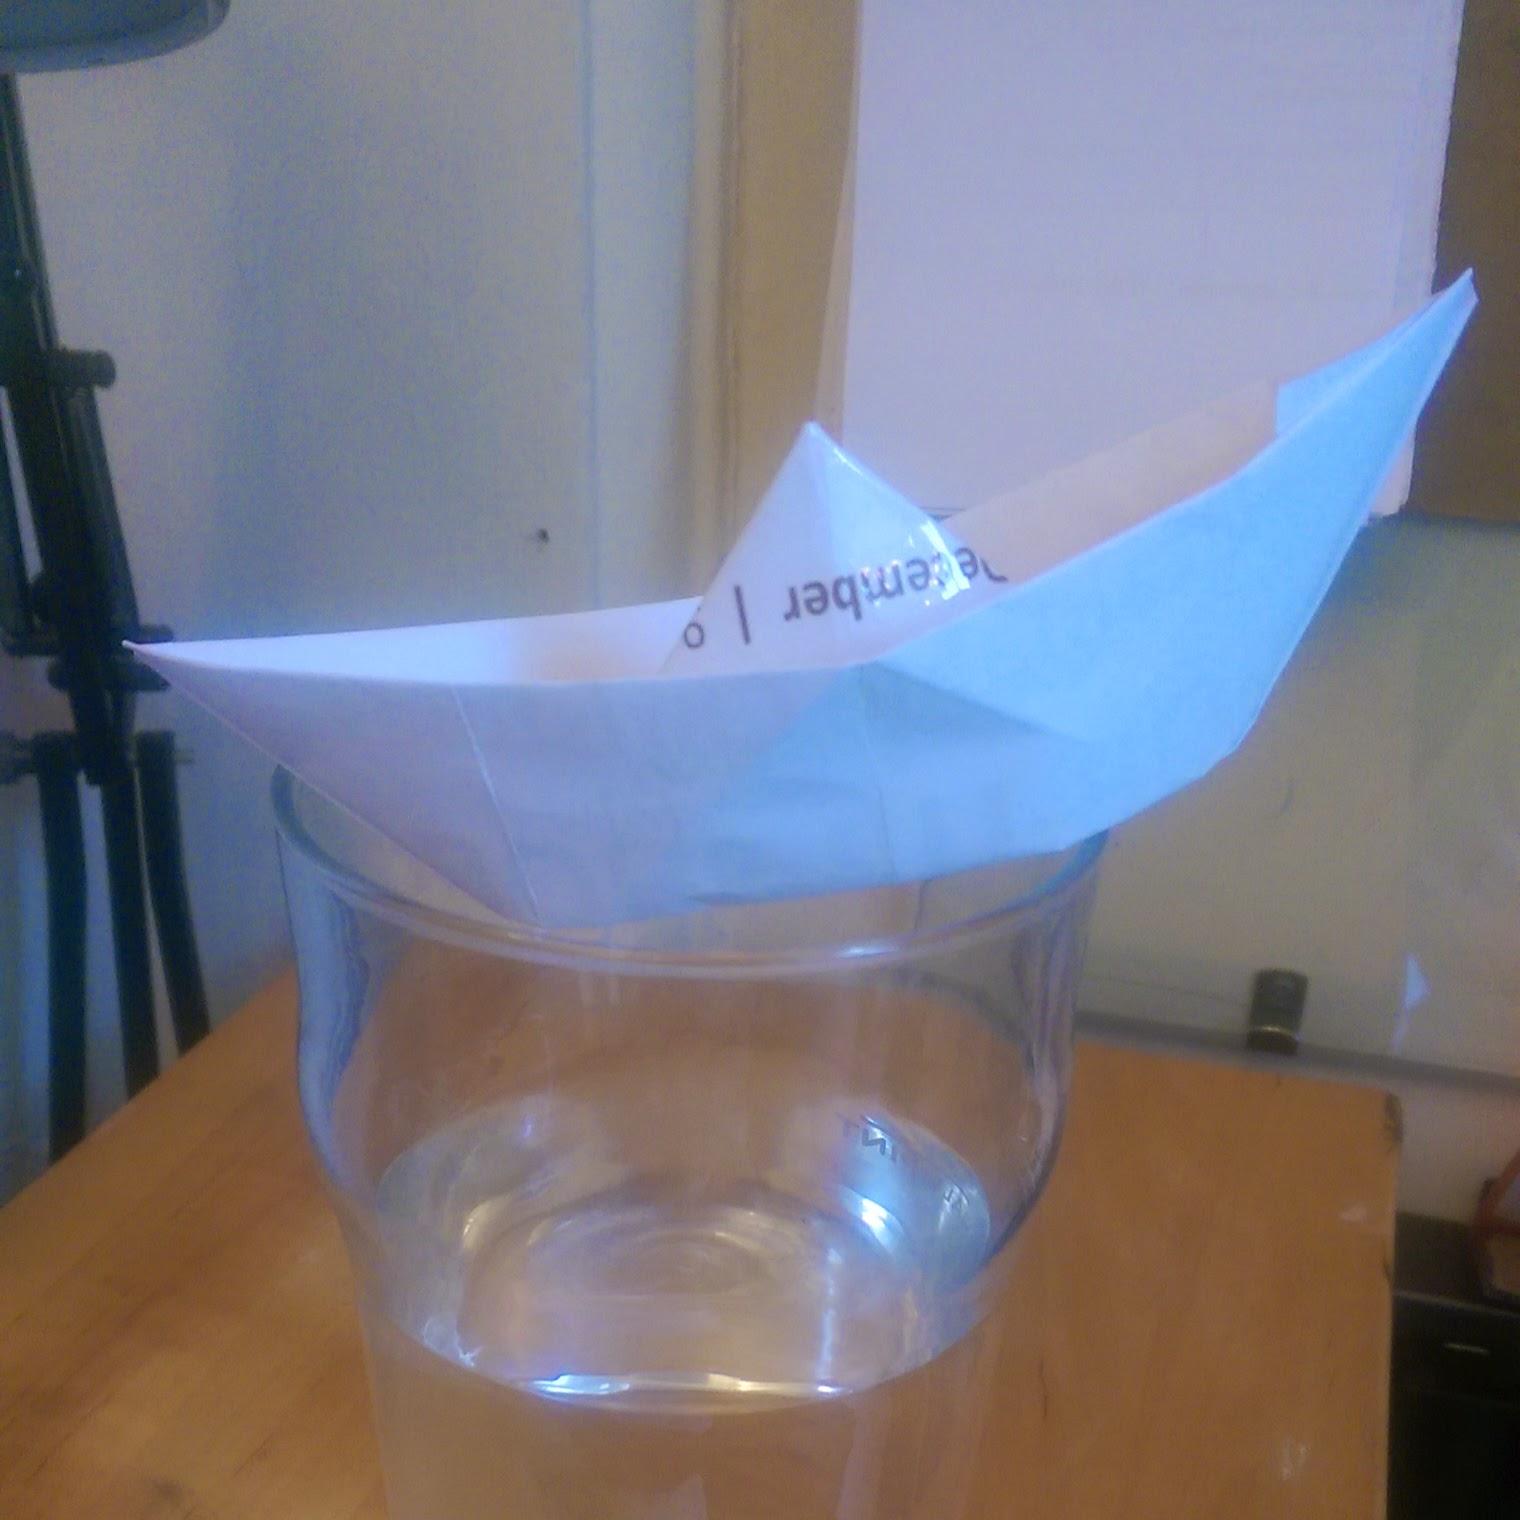 sustainable poo-up shop leaflet paper boat